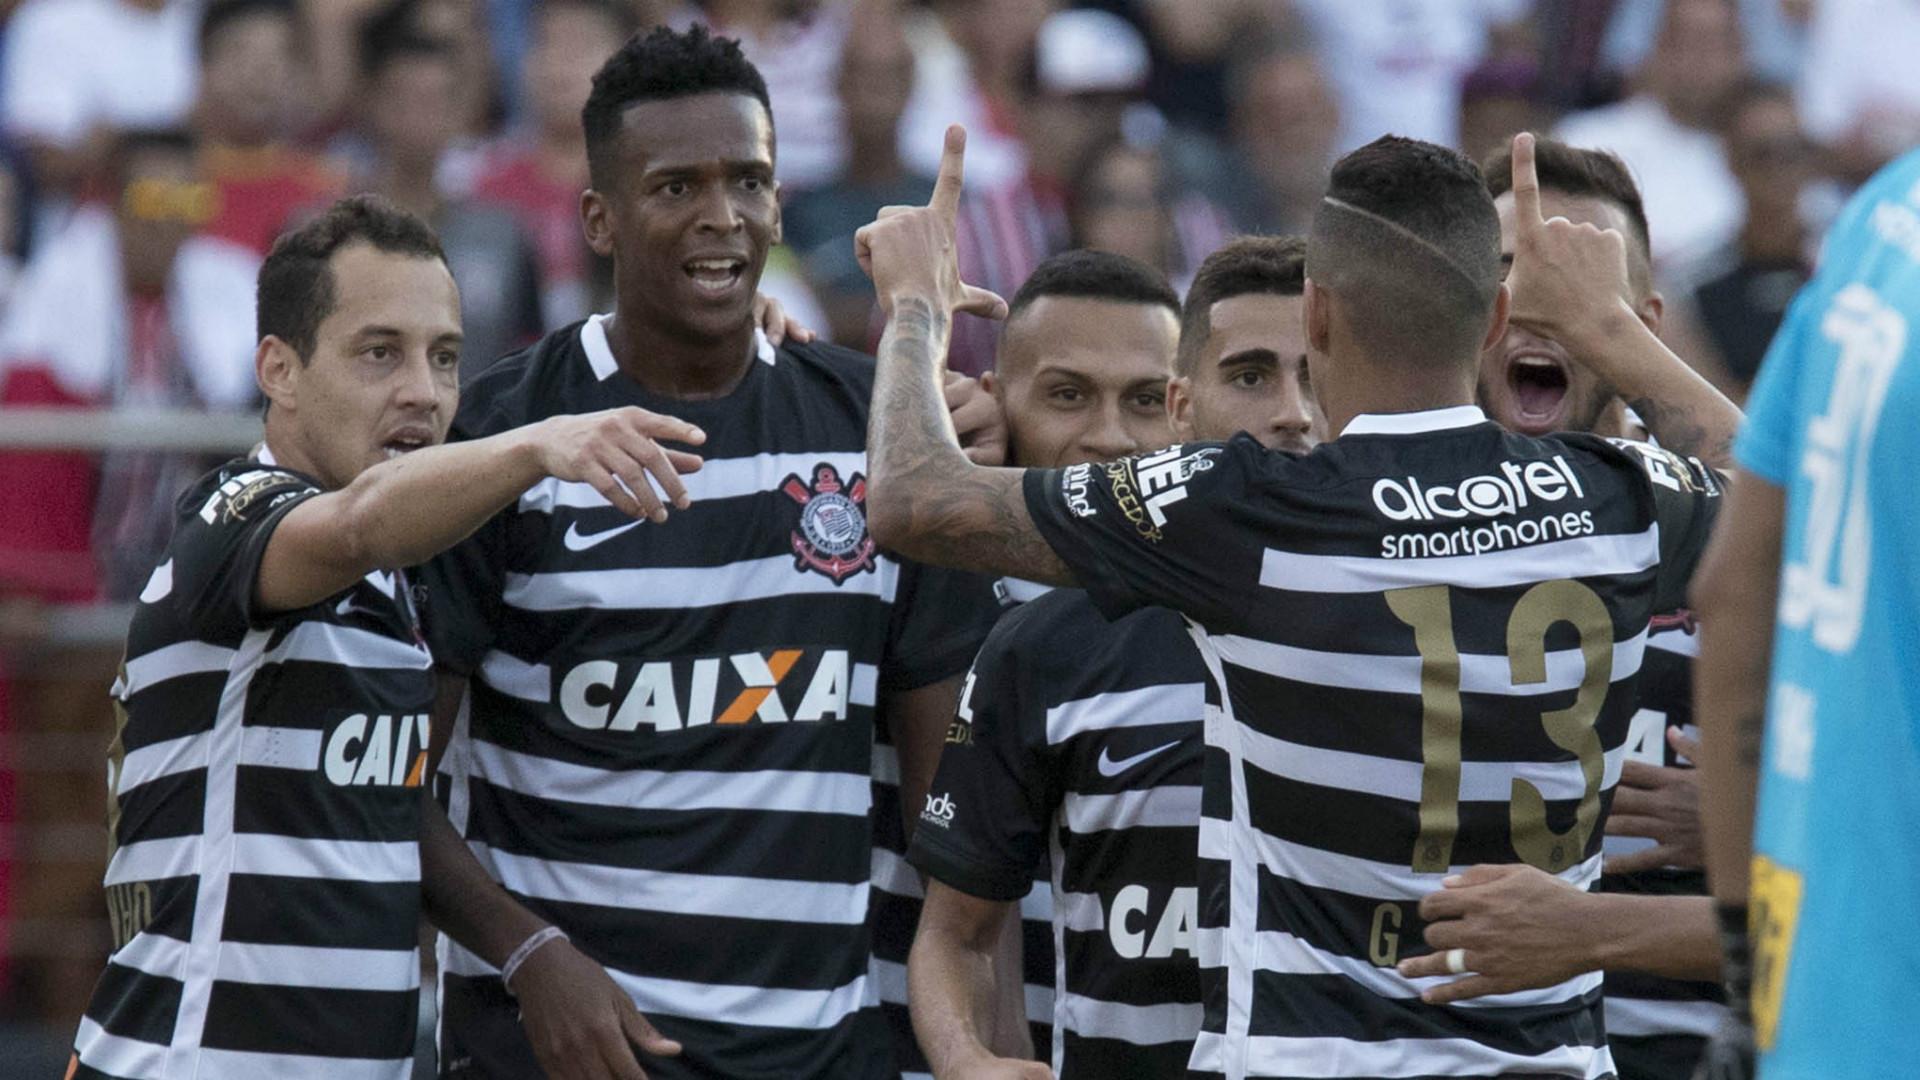 Jô, Rodriguinho, Guilherme Arana - Corinthians - 26/03/2017